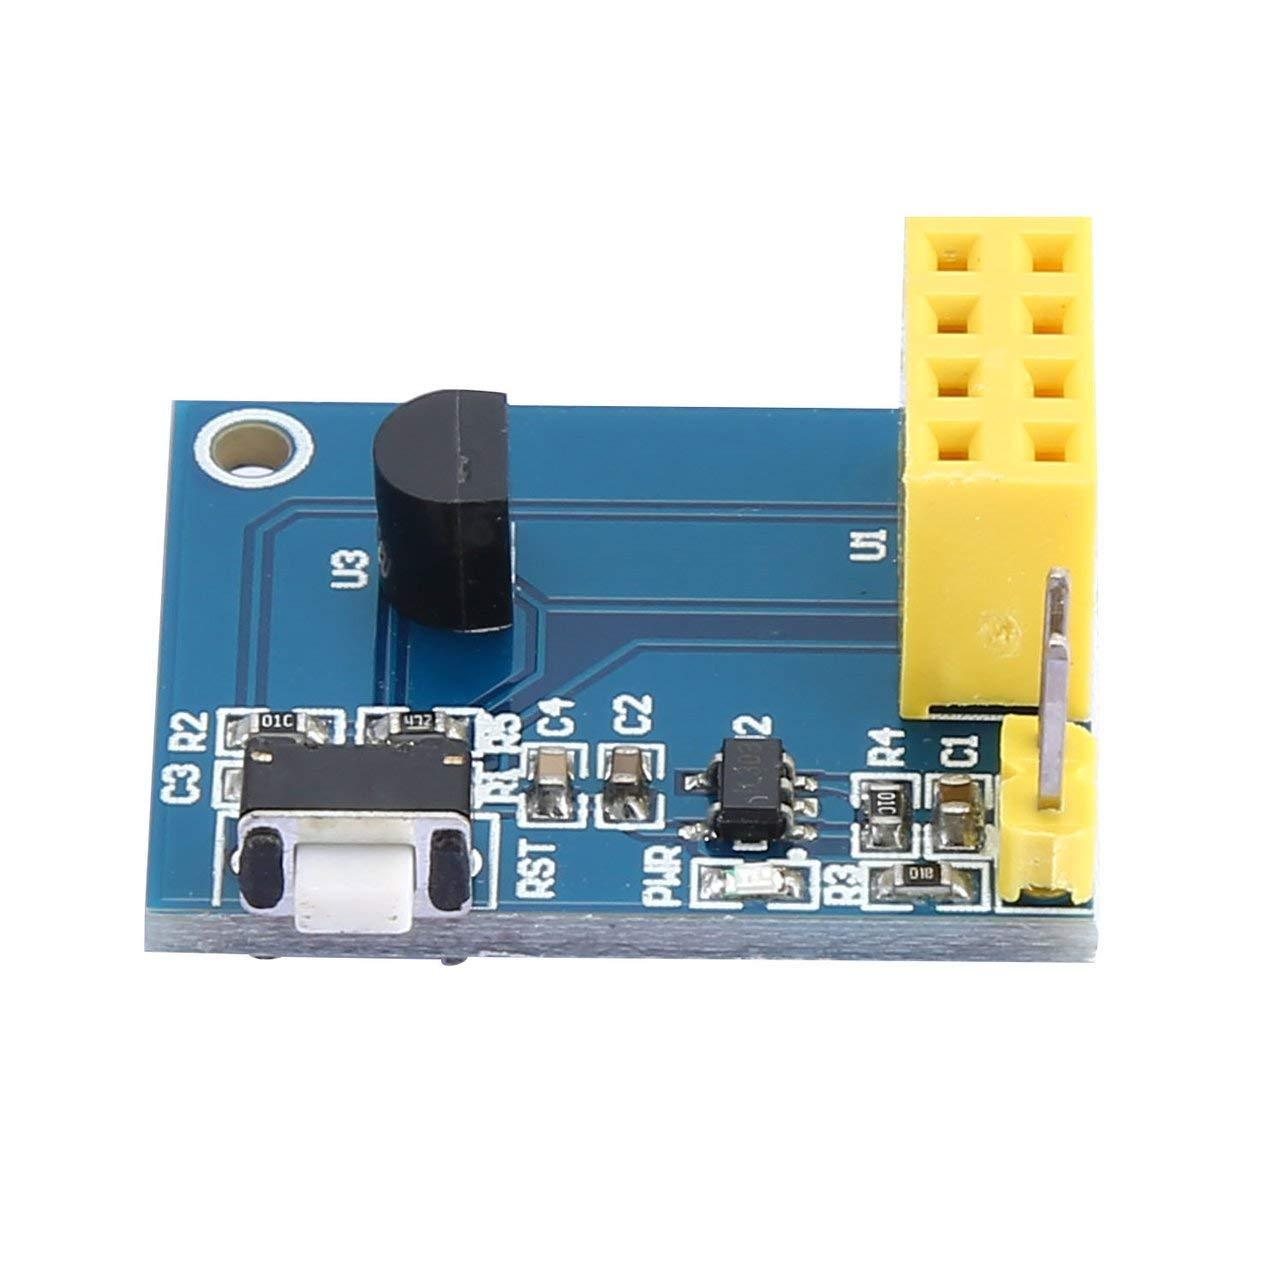 WOSOSYEYO ESP8266 ESP-01 ESP-01S DS18B20 Temperatura Sensor de Humedad M/ódulo WiFi NodeMCU Smart Home IOT DIY Kit sin m/ódulo ESP